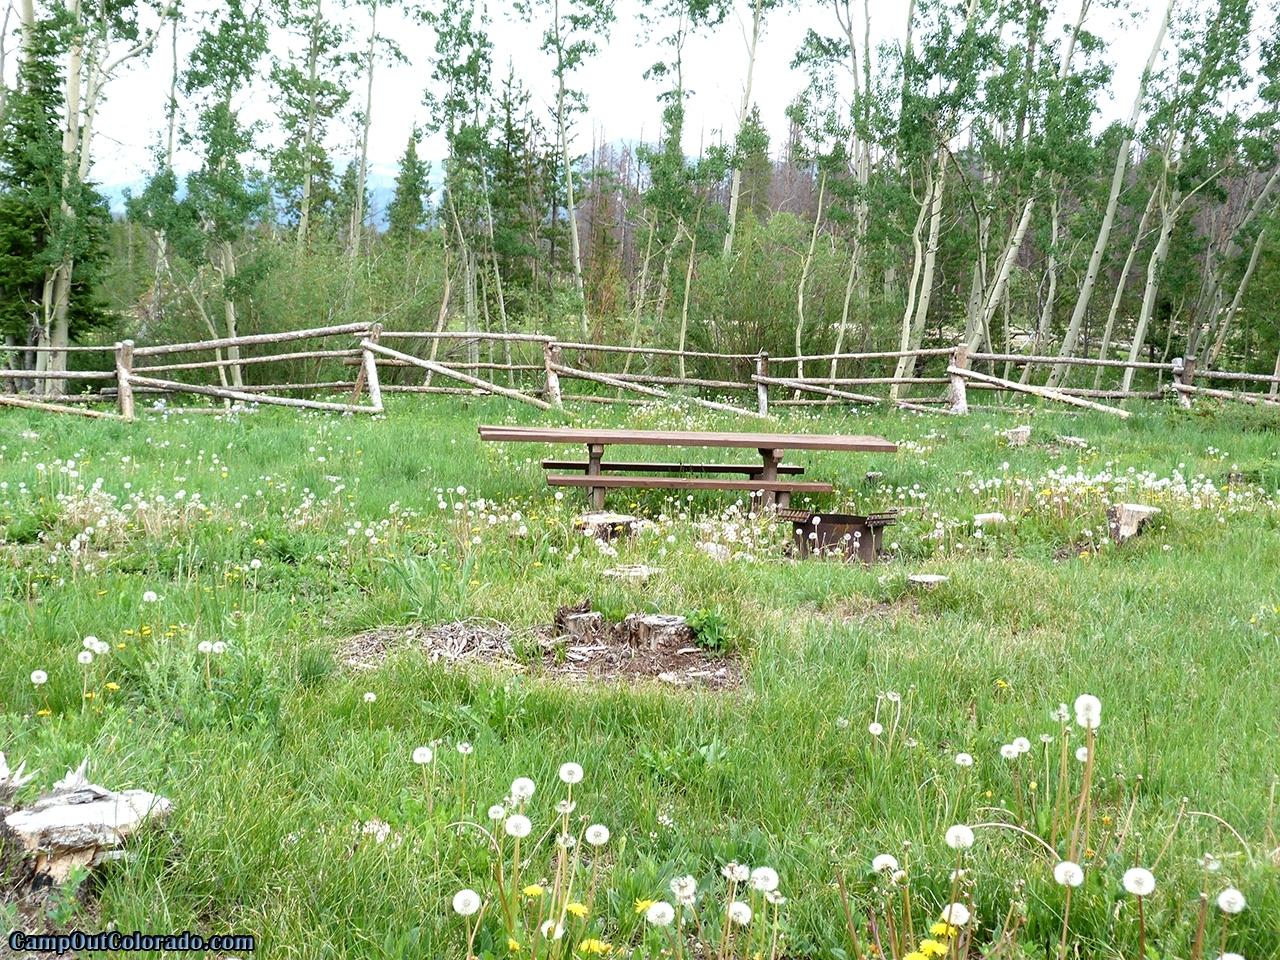 camp-out-colorado-aspen-campground-unused-campsite